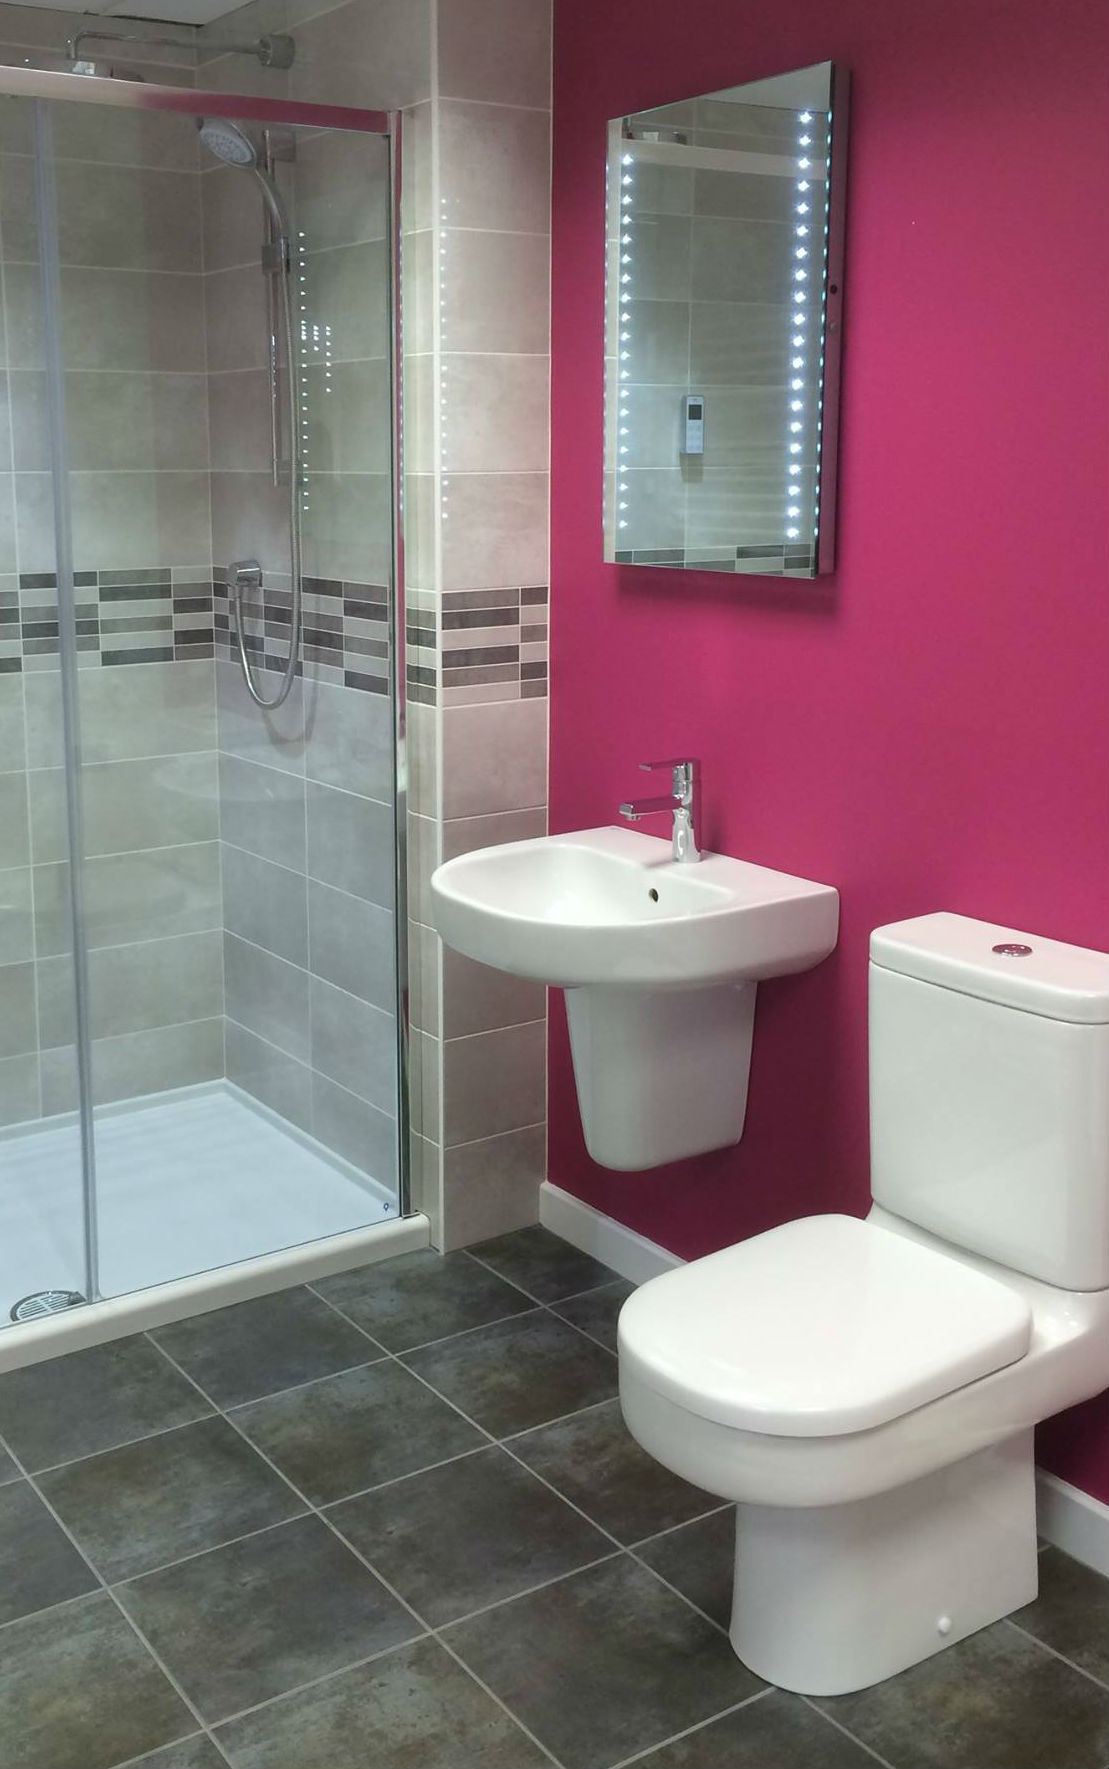 Fitted Bathrooms Bristol  Bespoke Bathroom Design and Installation